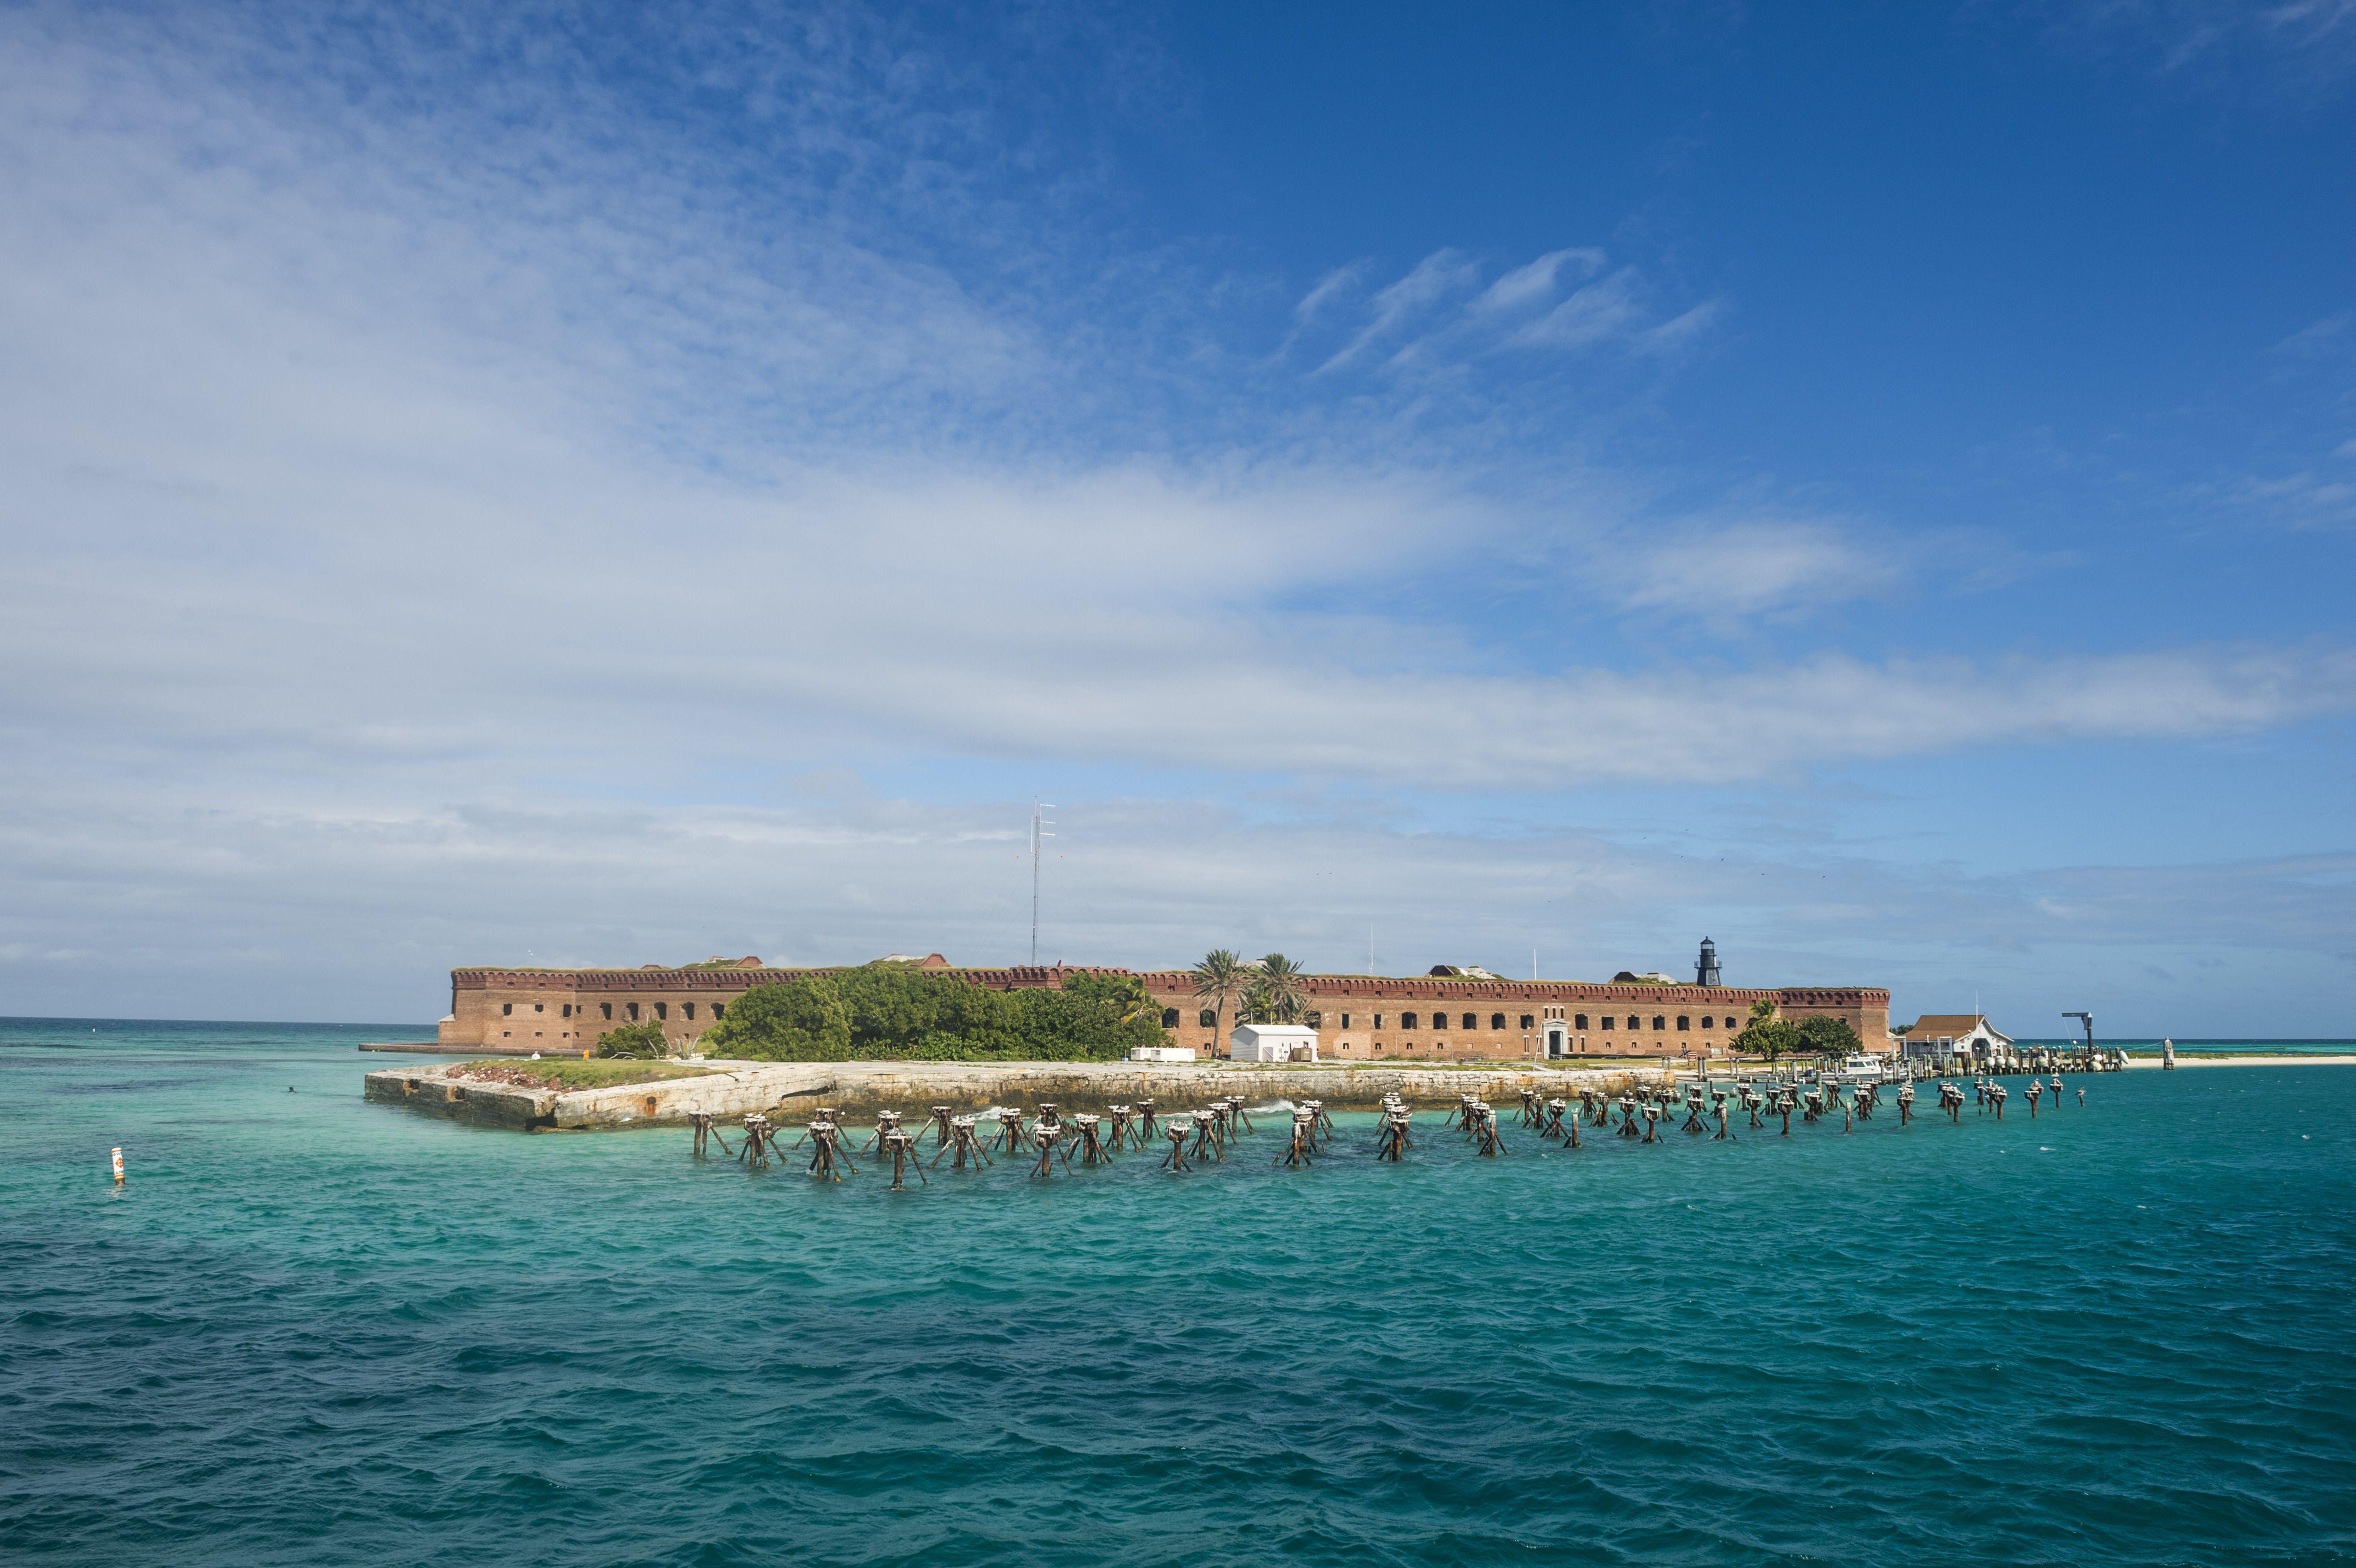 Fort Jefferson, Dry Tortugas National Park, Florida Keys, Florida, United States of America, North America